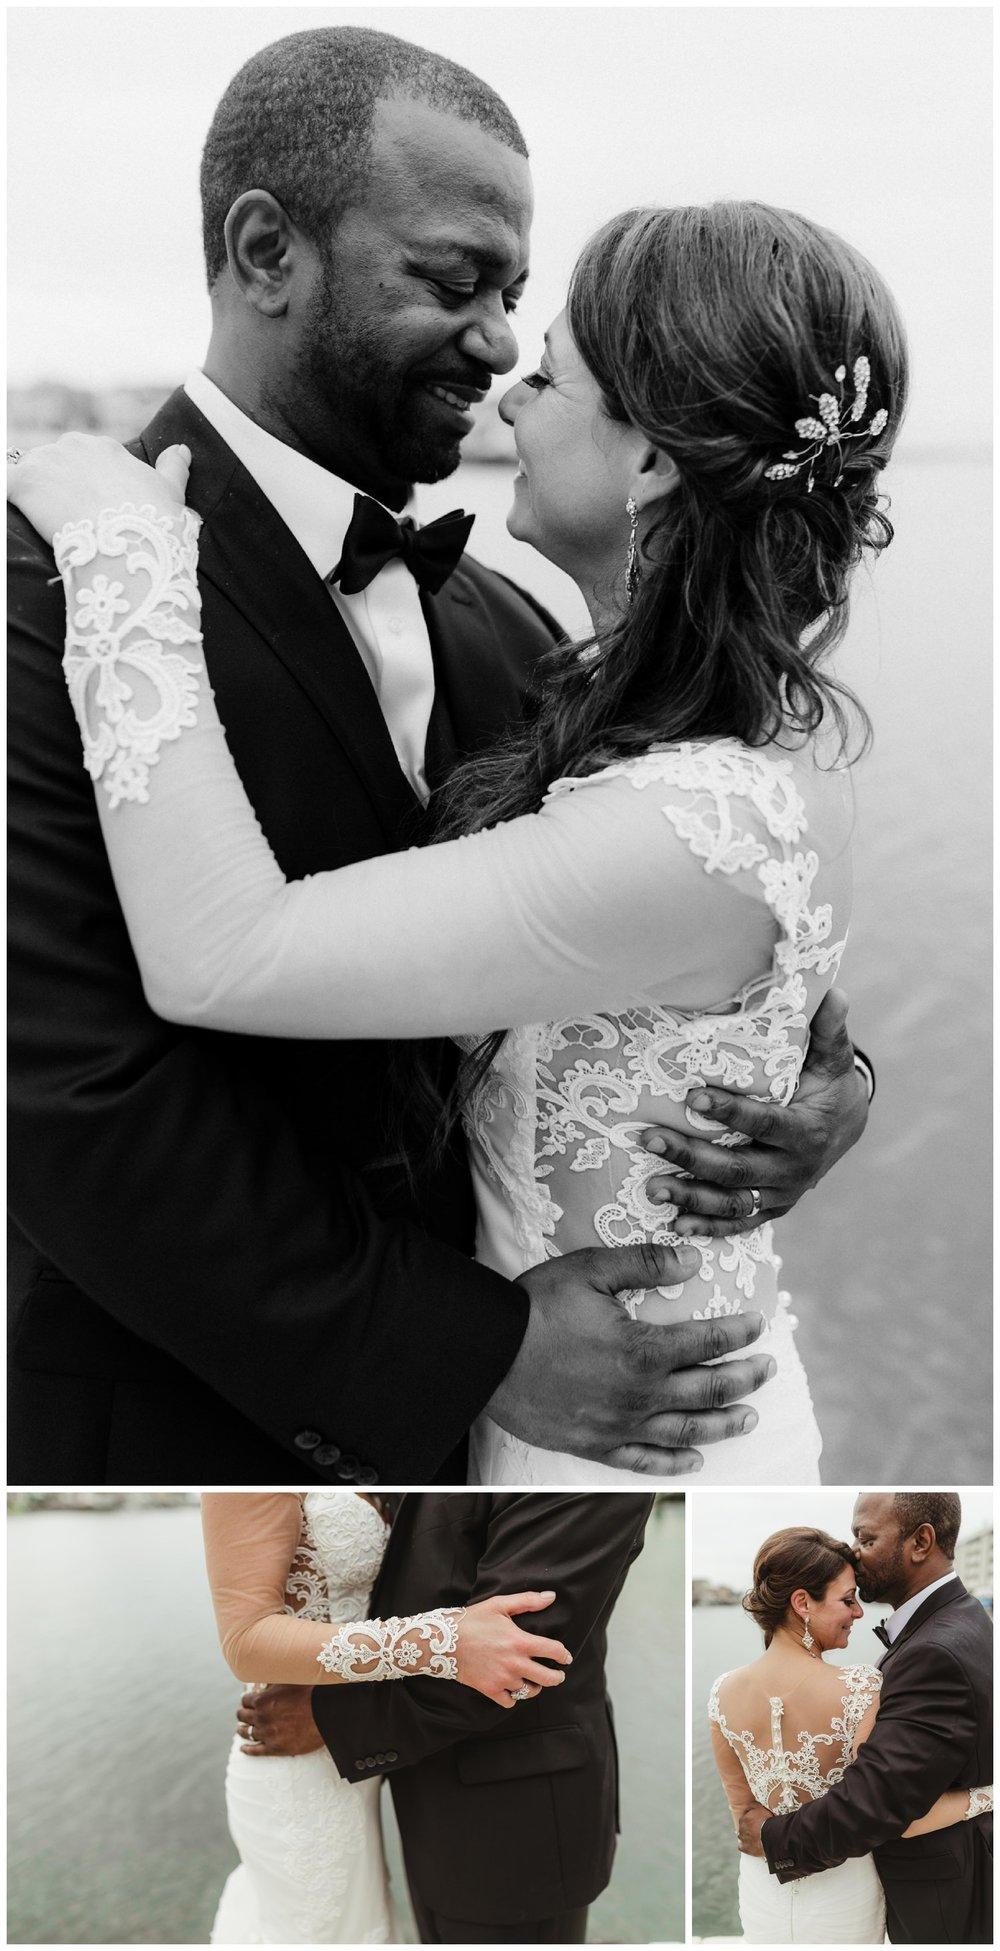 JillandLennon_TheReeds_ShelterHaven_StoneHarbor_NJ_NewJersey__SouthJersey_Wedding_Photographer_MagdalenaStudios_0325.jpg